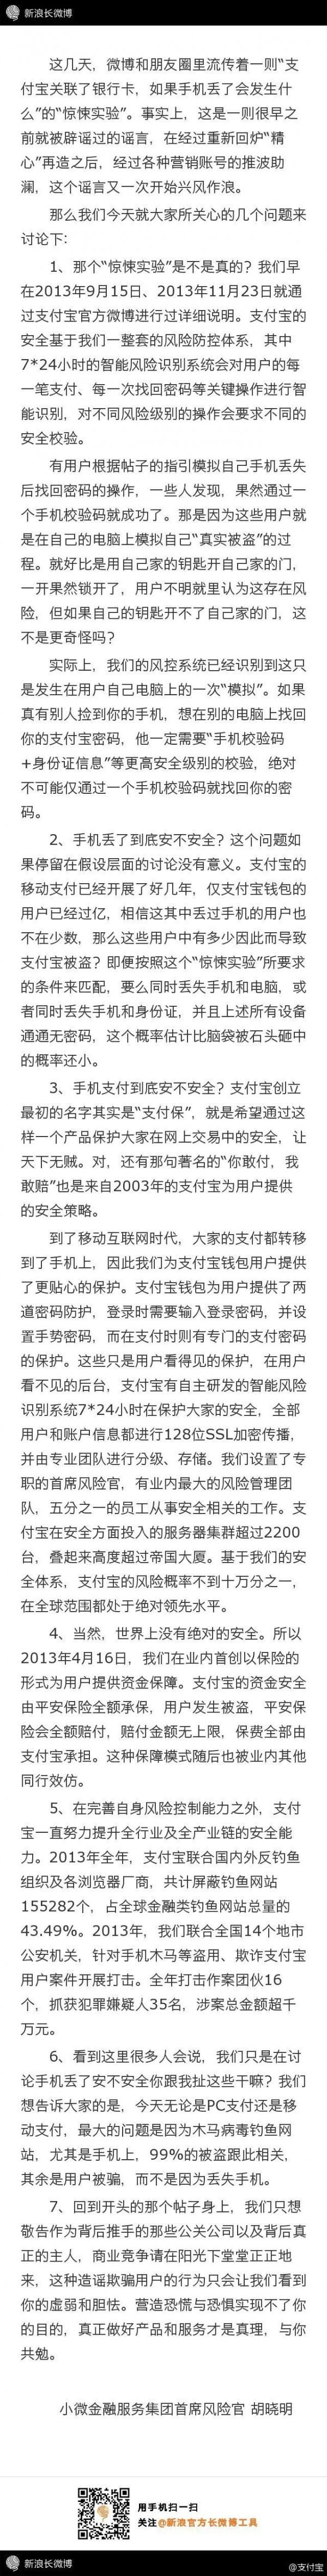 http://static.cnbetacdn.com/newsimg/2014/0119/25_1iSVNO8cr.jpg_w600.jpg